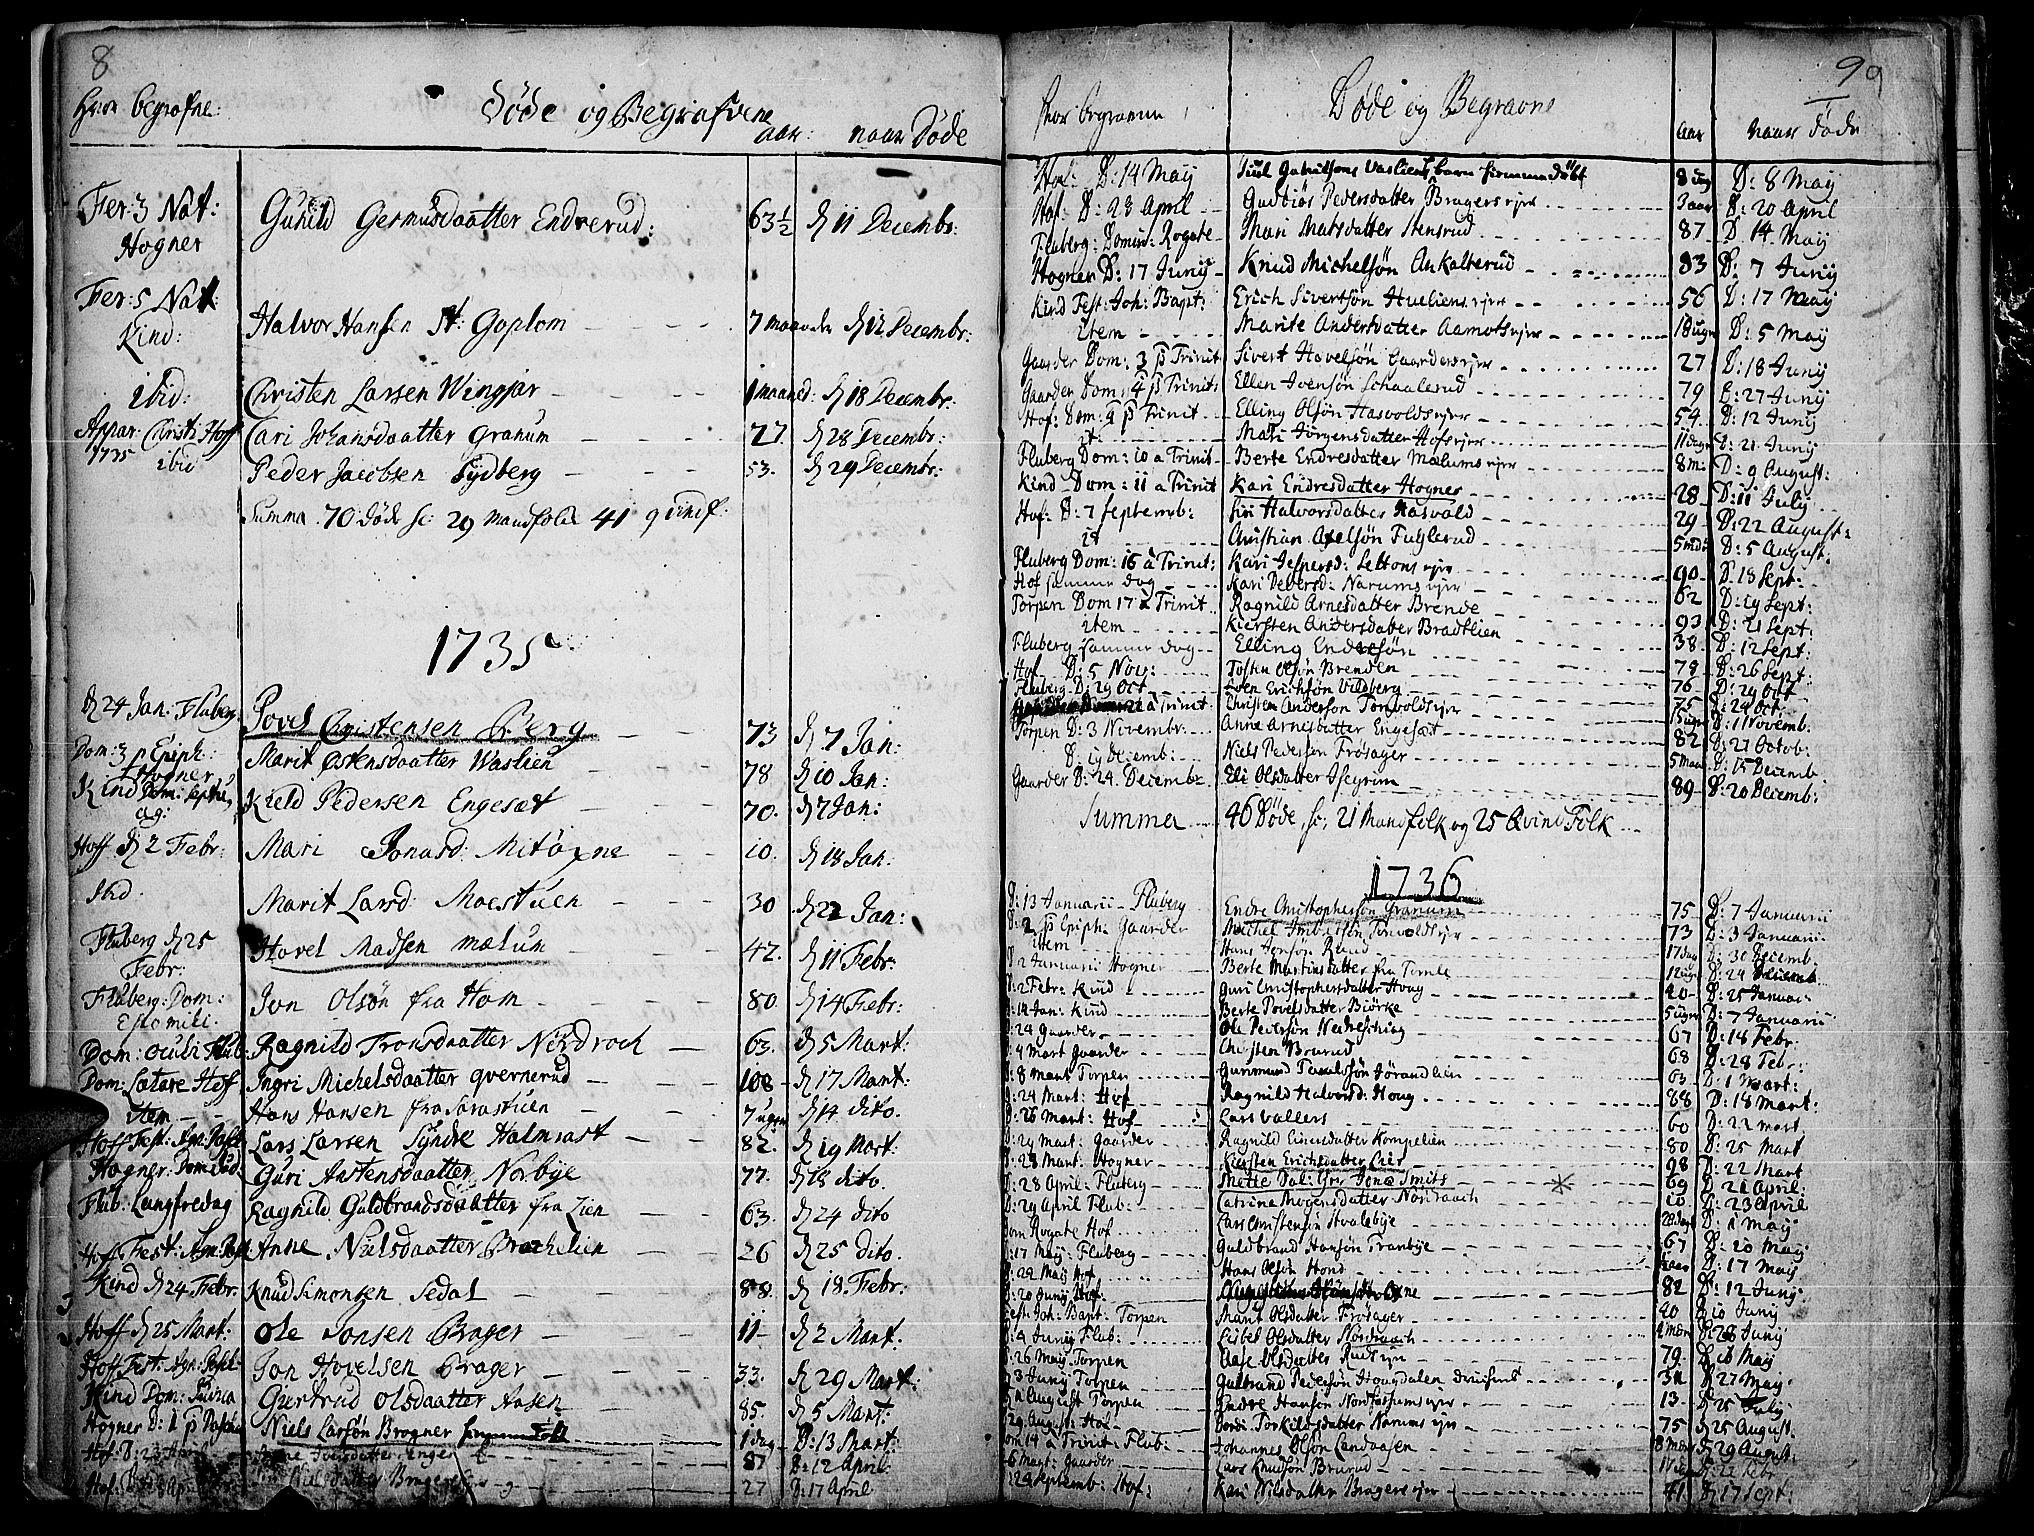 SAH, Land prestekontor, Ministerialbok nr. 4, 1733-1764, s. 8-9